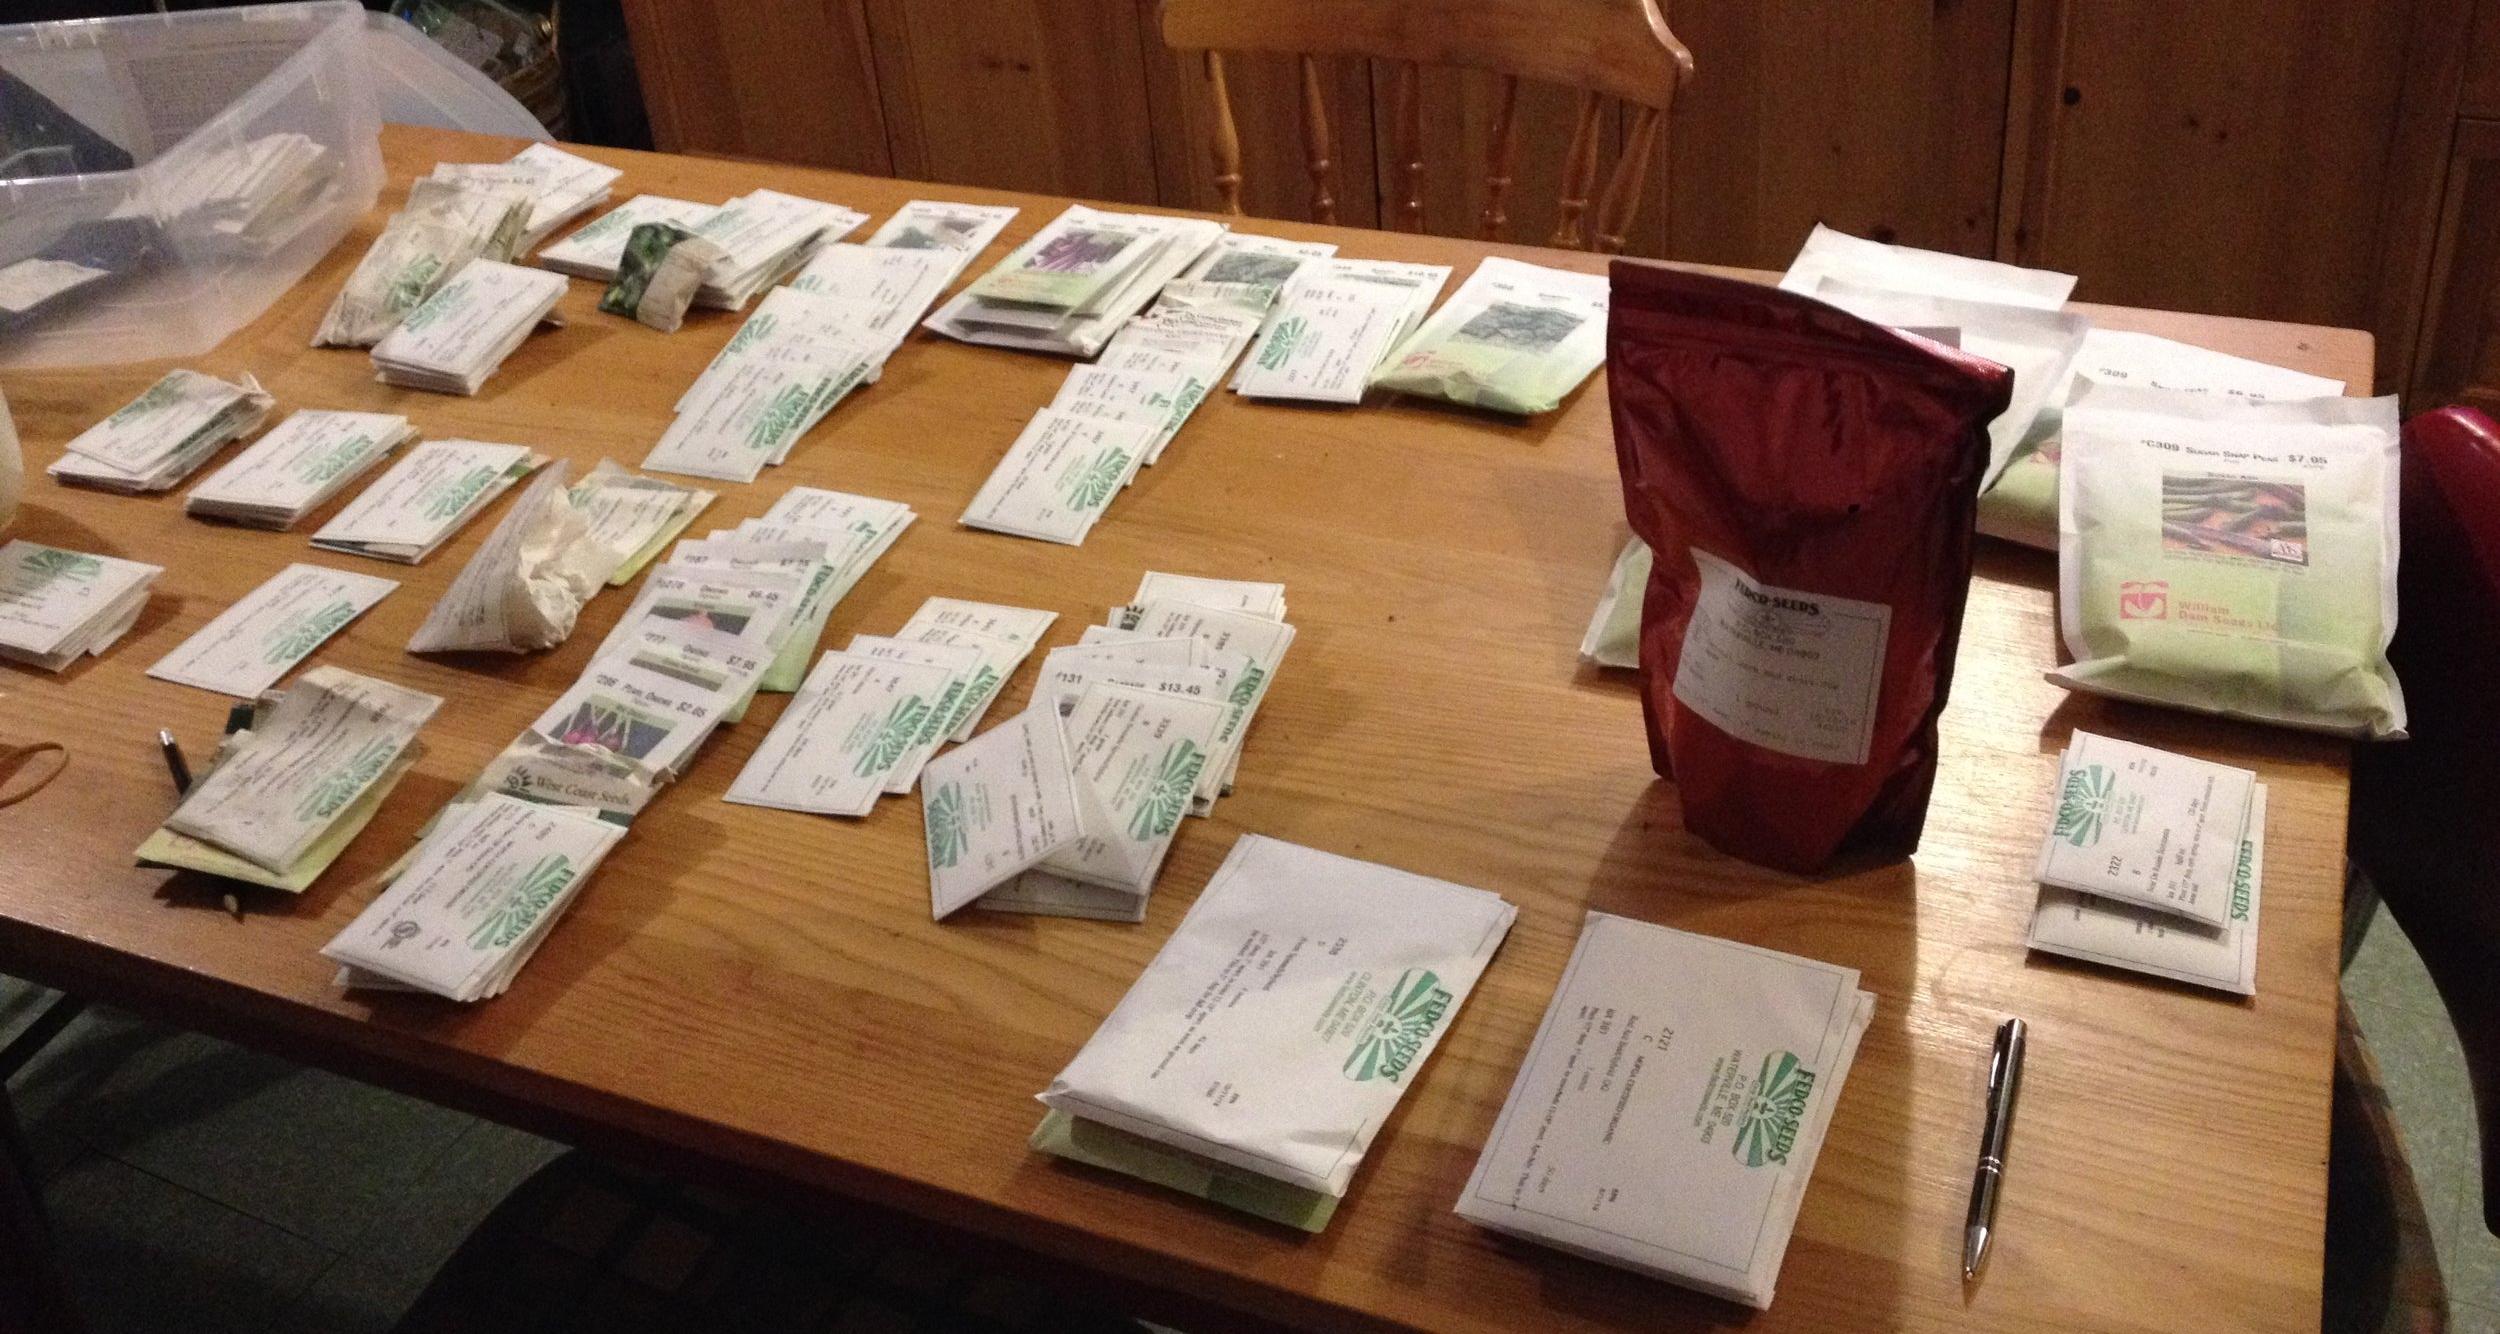 Organizing 2017 seed order